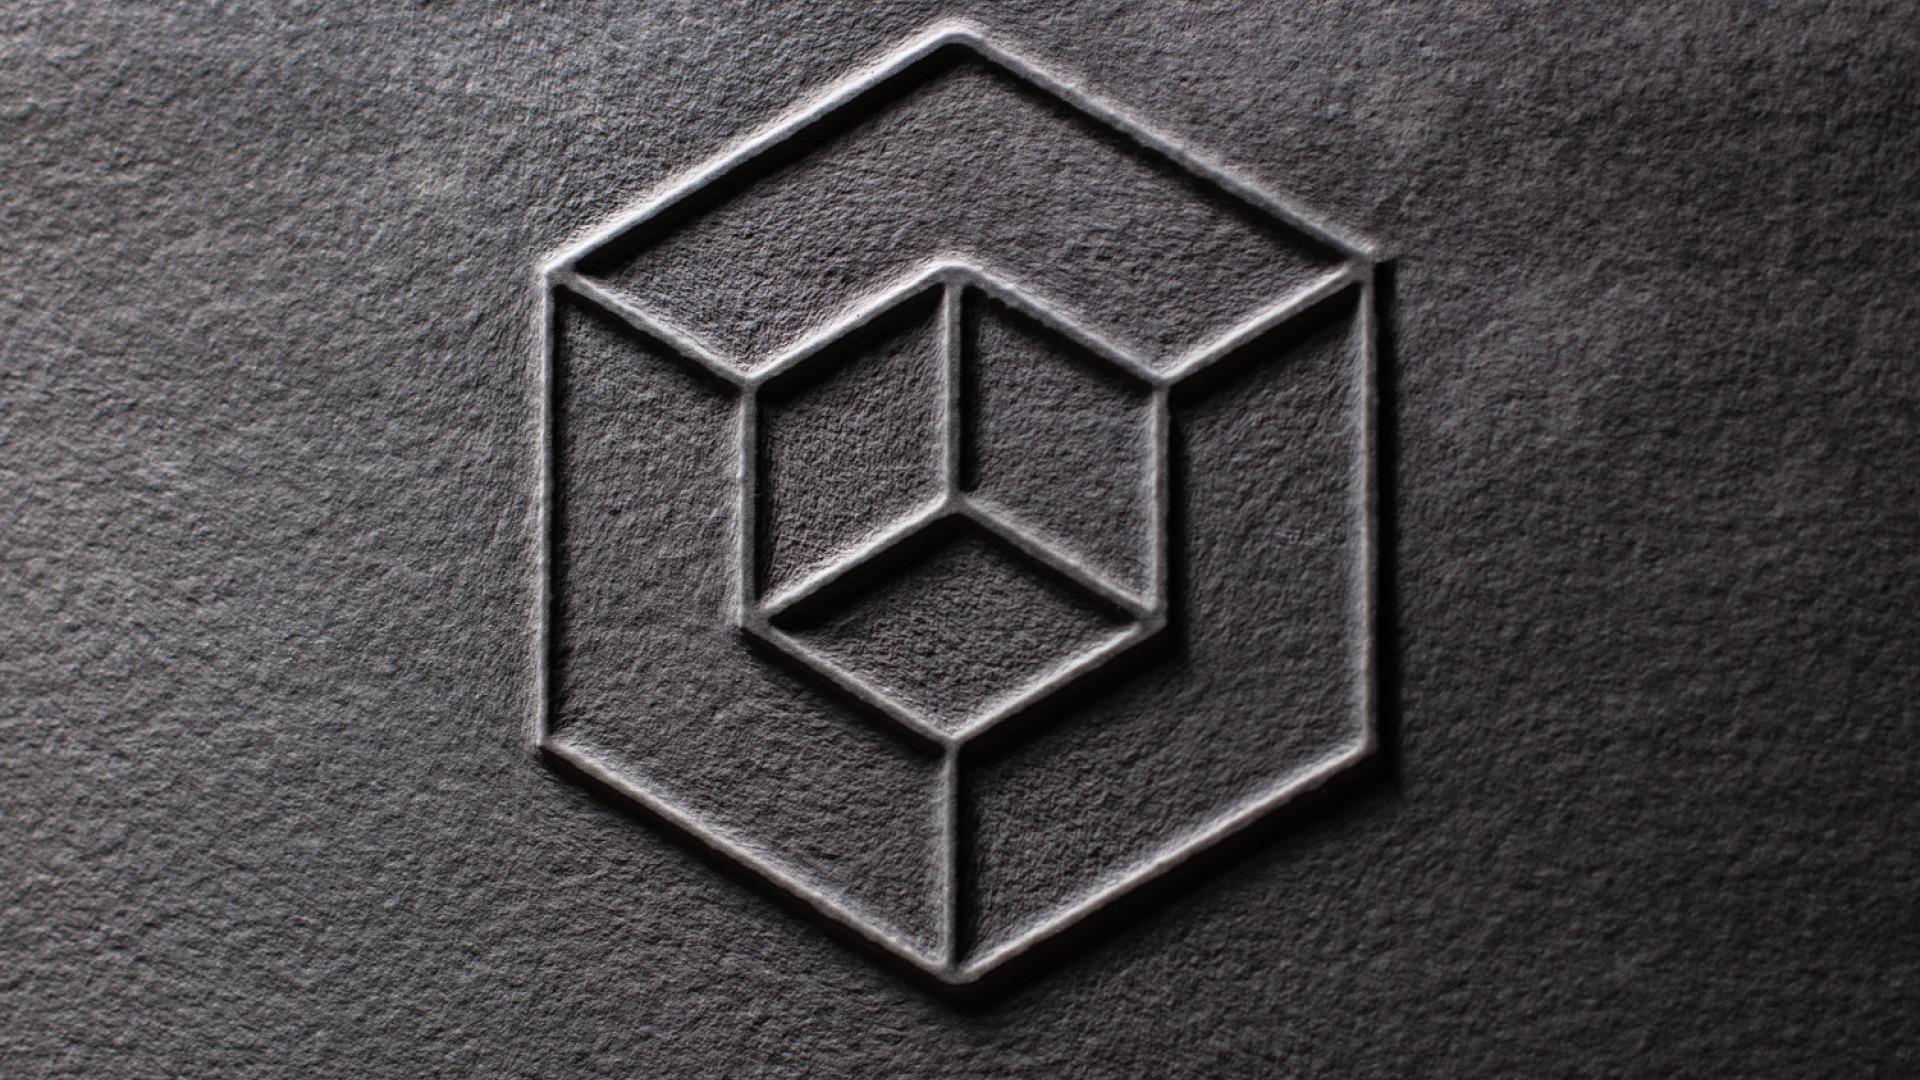 dimense_concrete-16_1596191268-e4651d1d4a322bfbedf9b944cb42b074.jpg